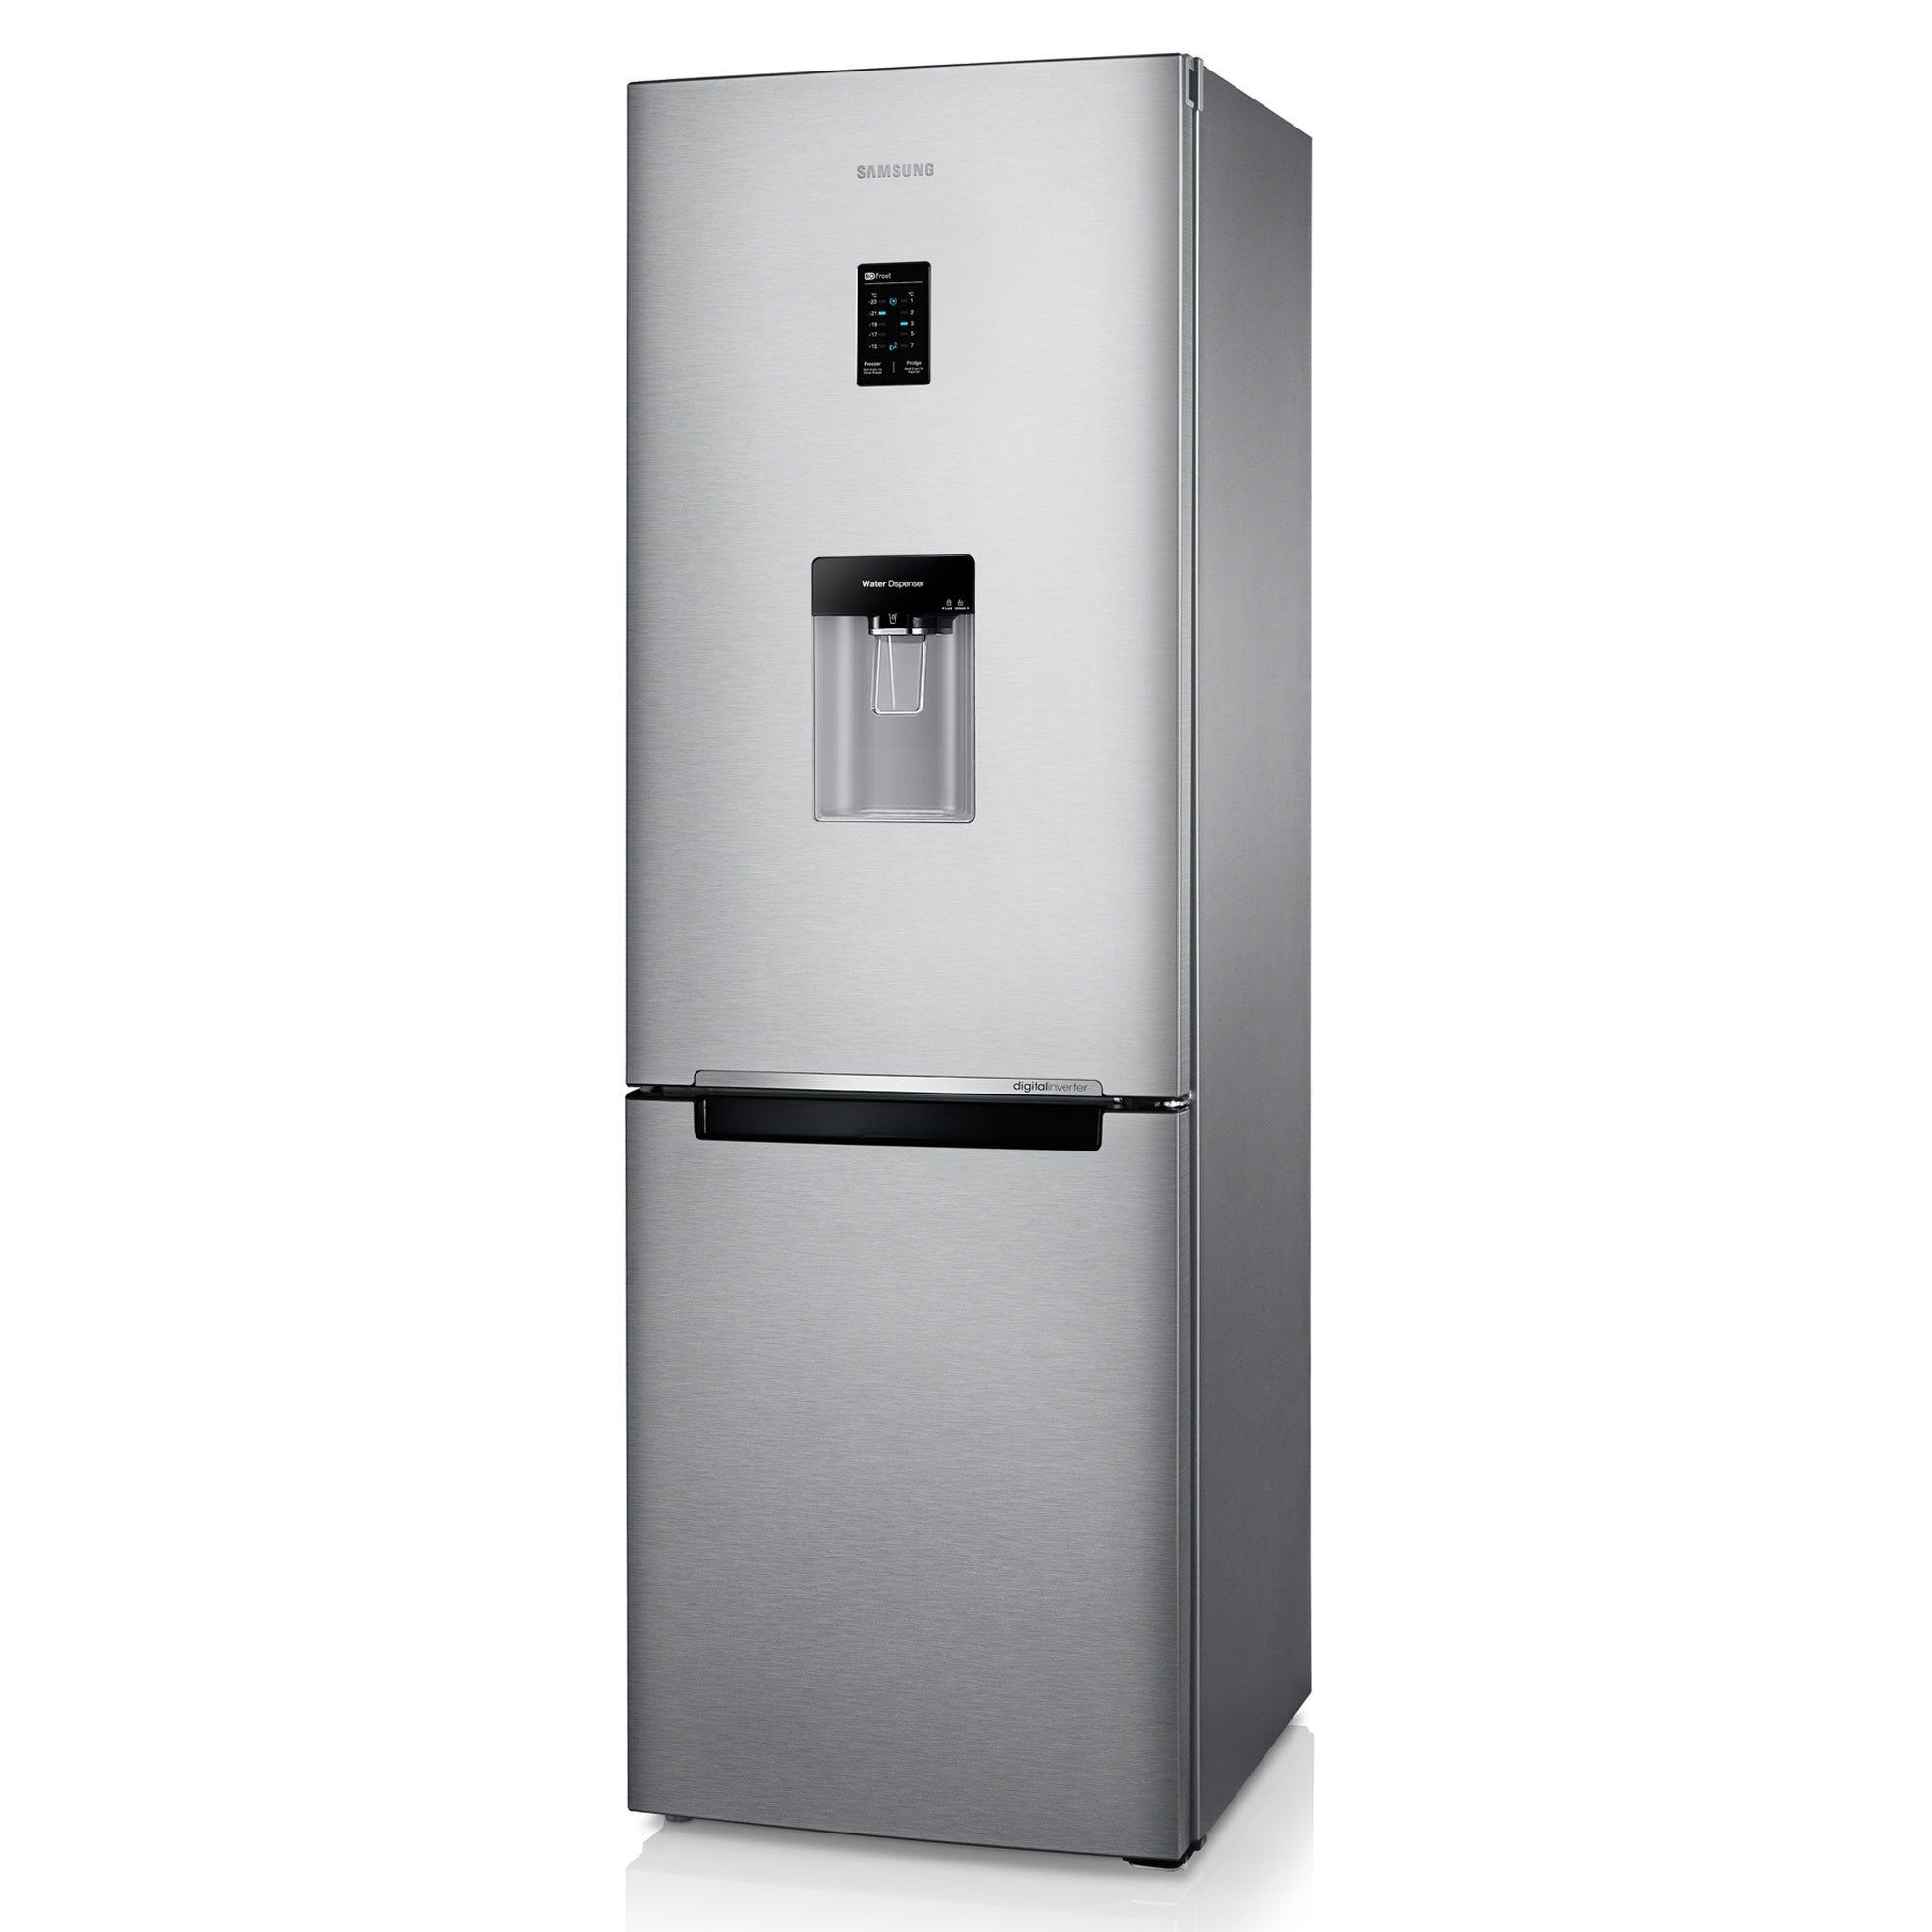 Samsung Silver Fridge Freezer With Water Dispenser